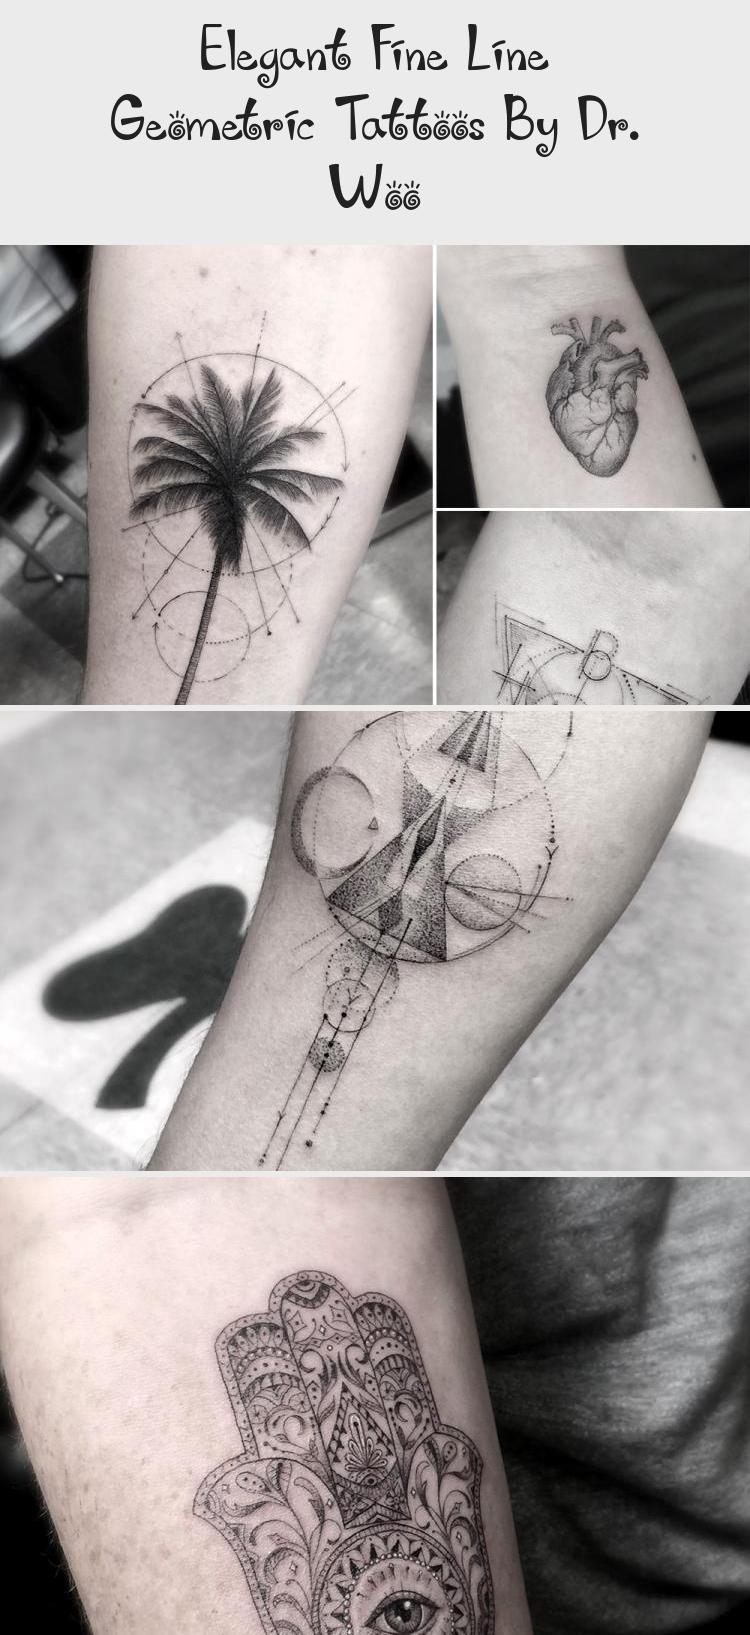 Elegant Fine Line Geometric Tattoos By Dr. Woo | Tattoos